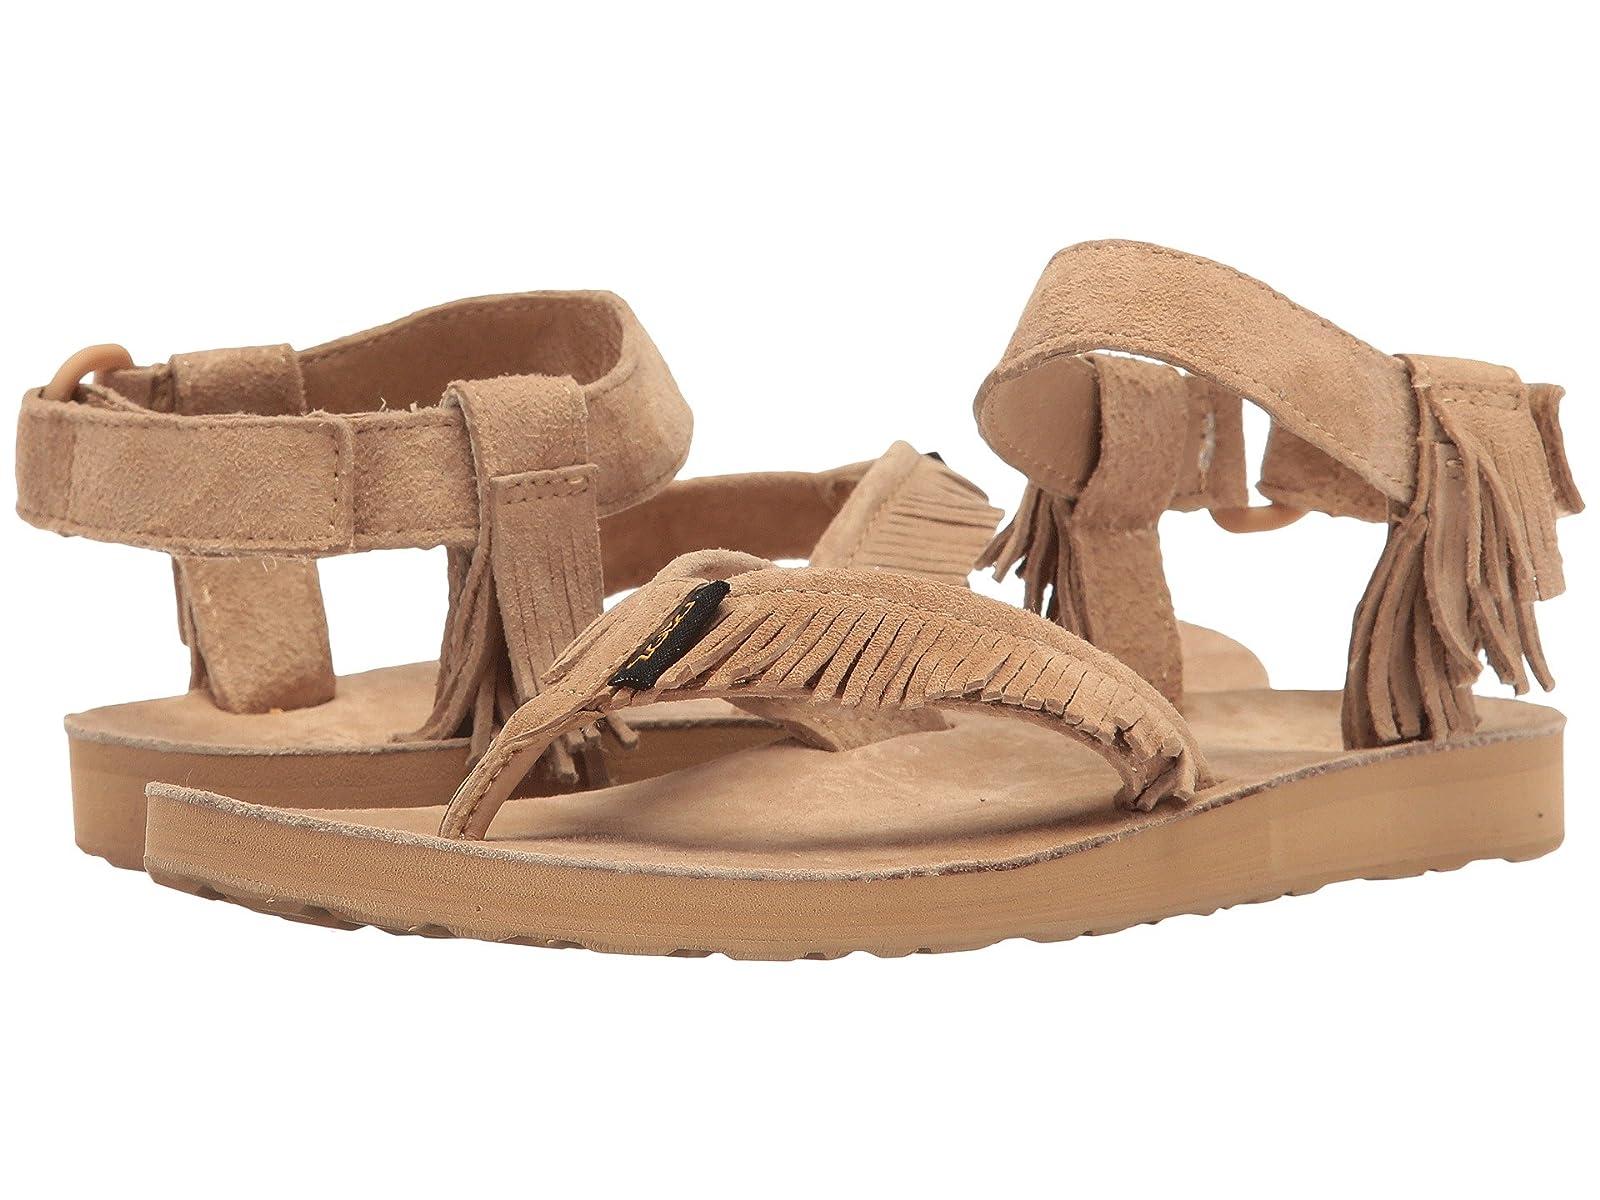 Teva Original Sandal Leather FringeCheap and distinctive eye-catching shoes